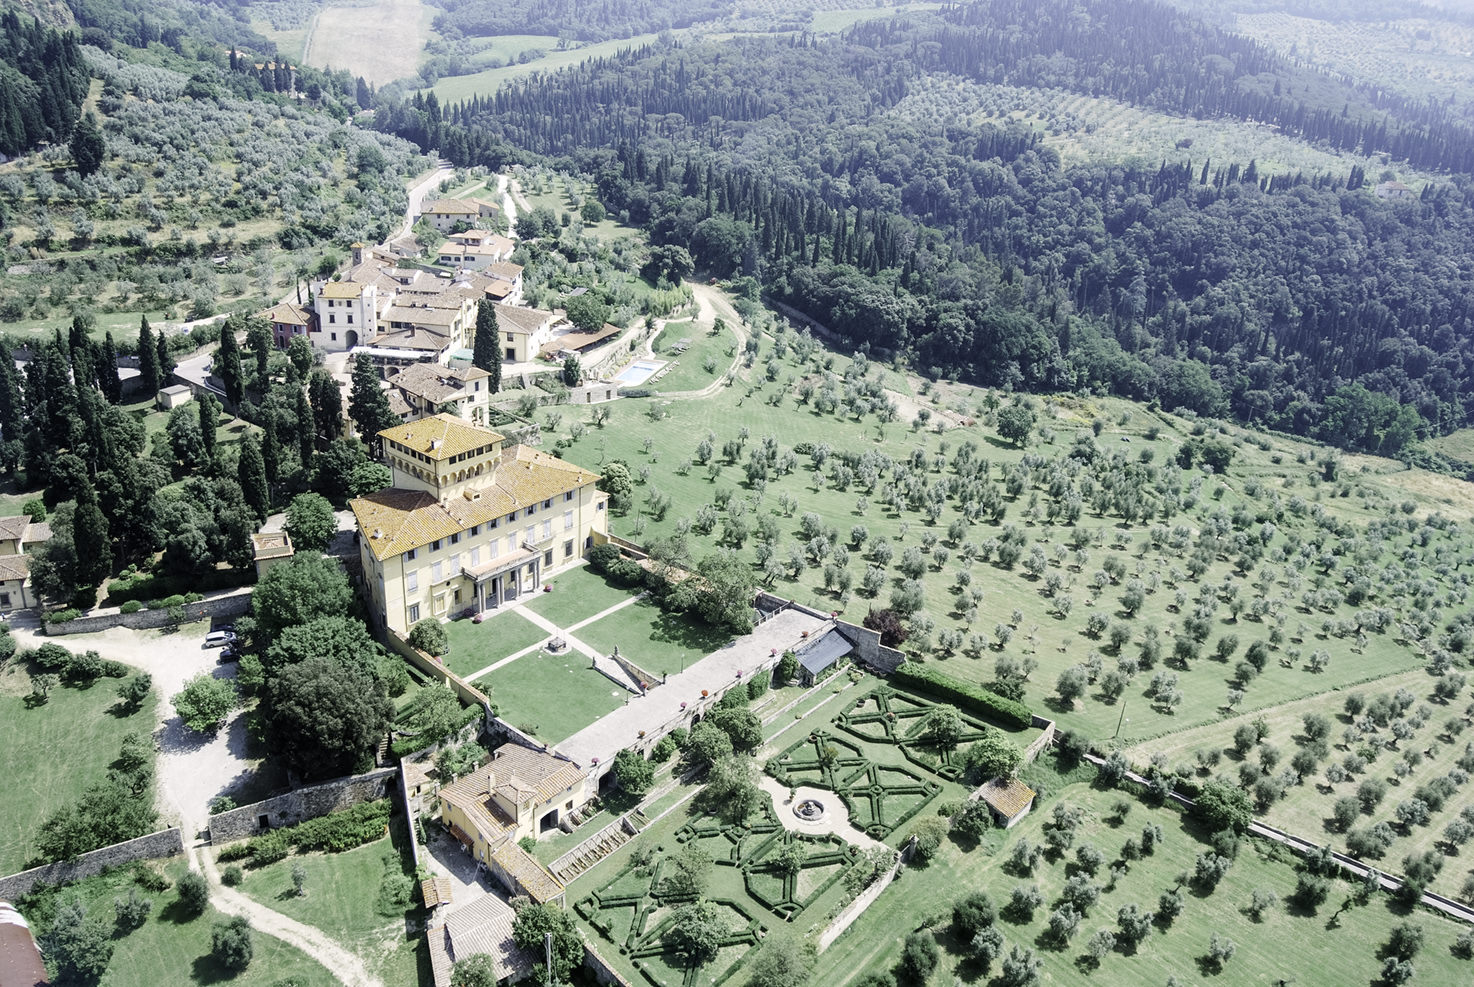 Aerial view of Villa di Maiano near Florence